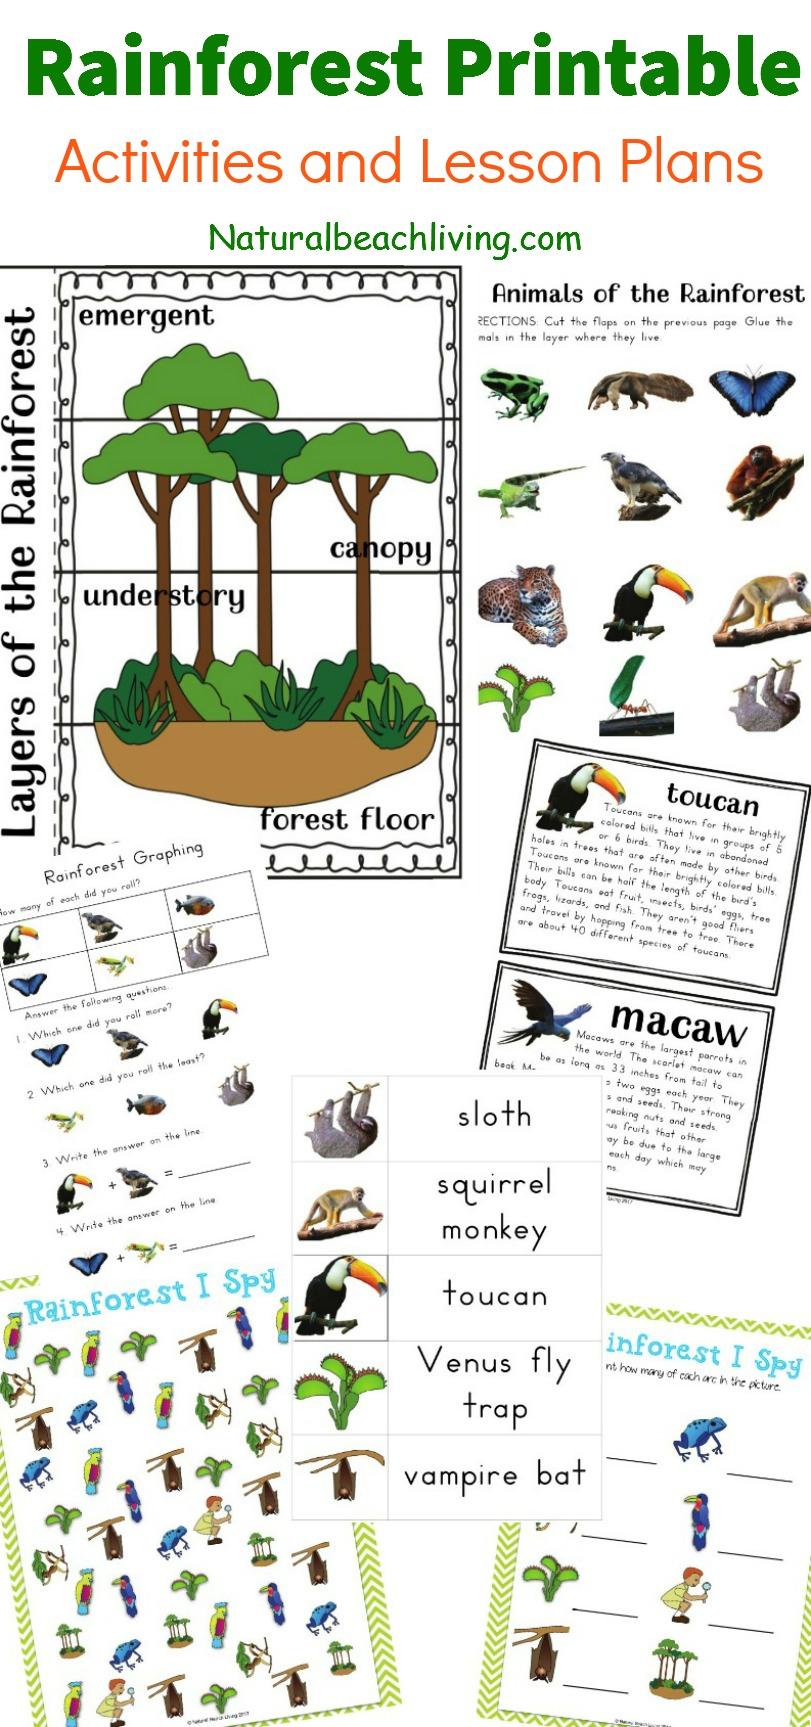 The Best Rainforest Printable Activities For Kids - Natural Beach Living | Rainforest Printable Worksheets